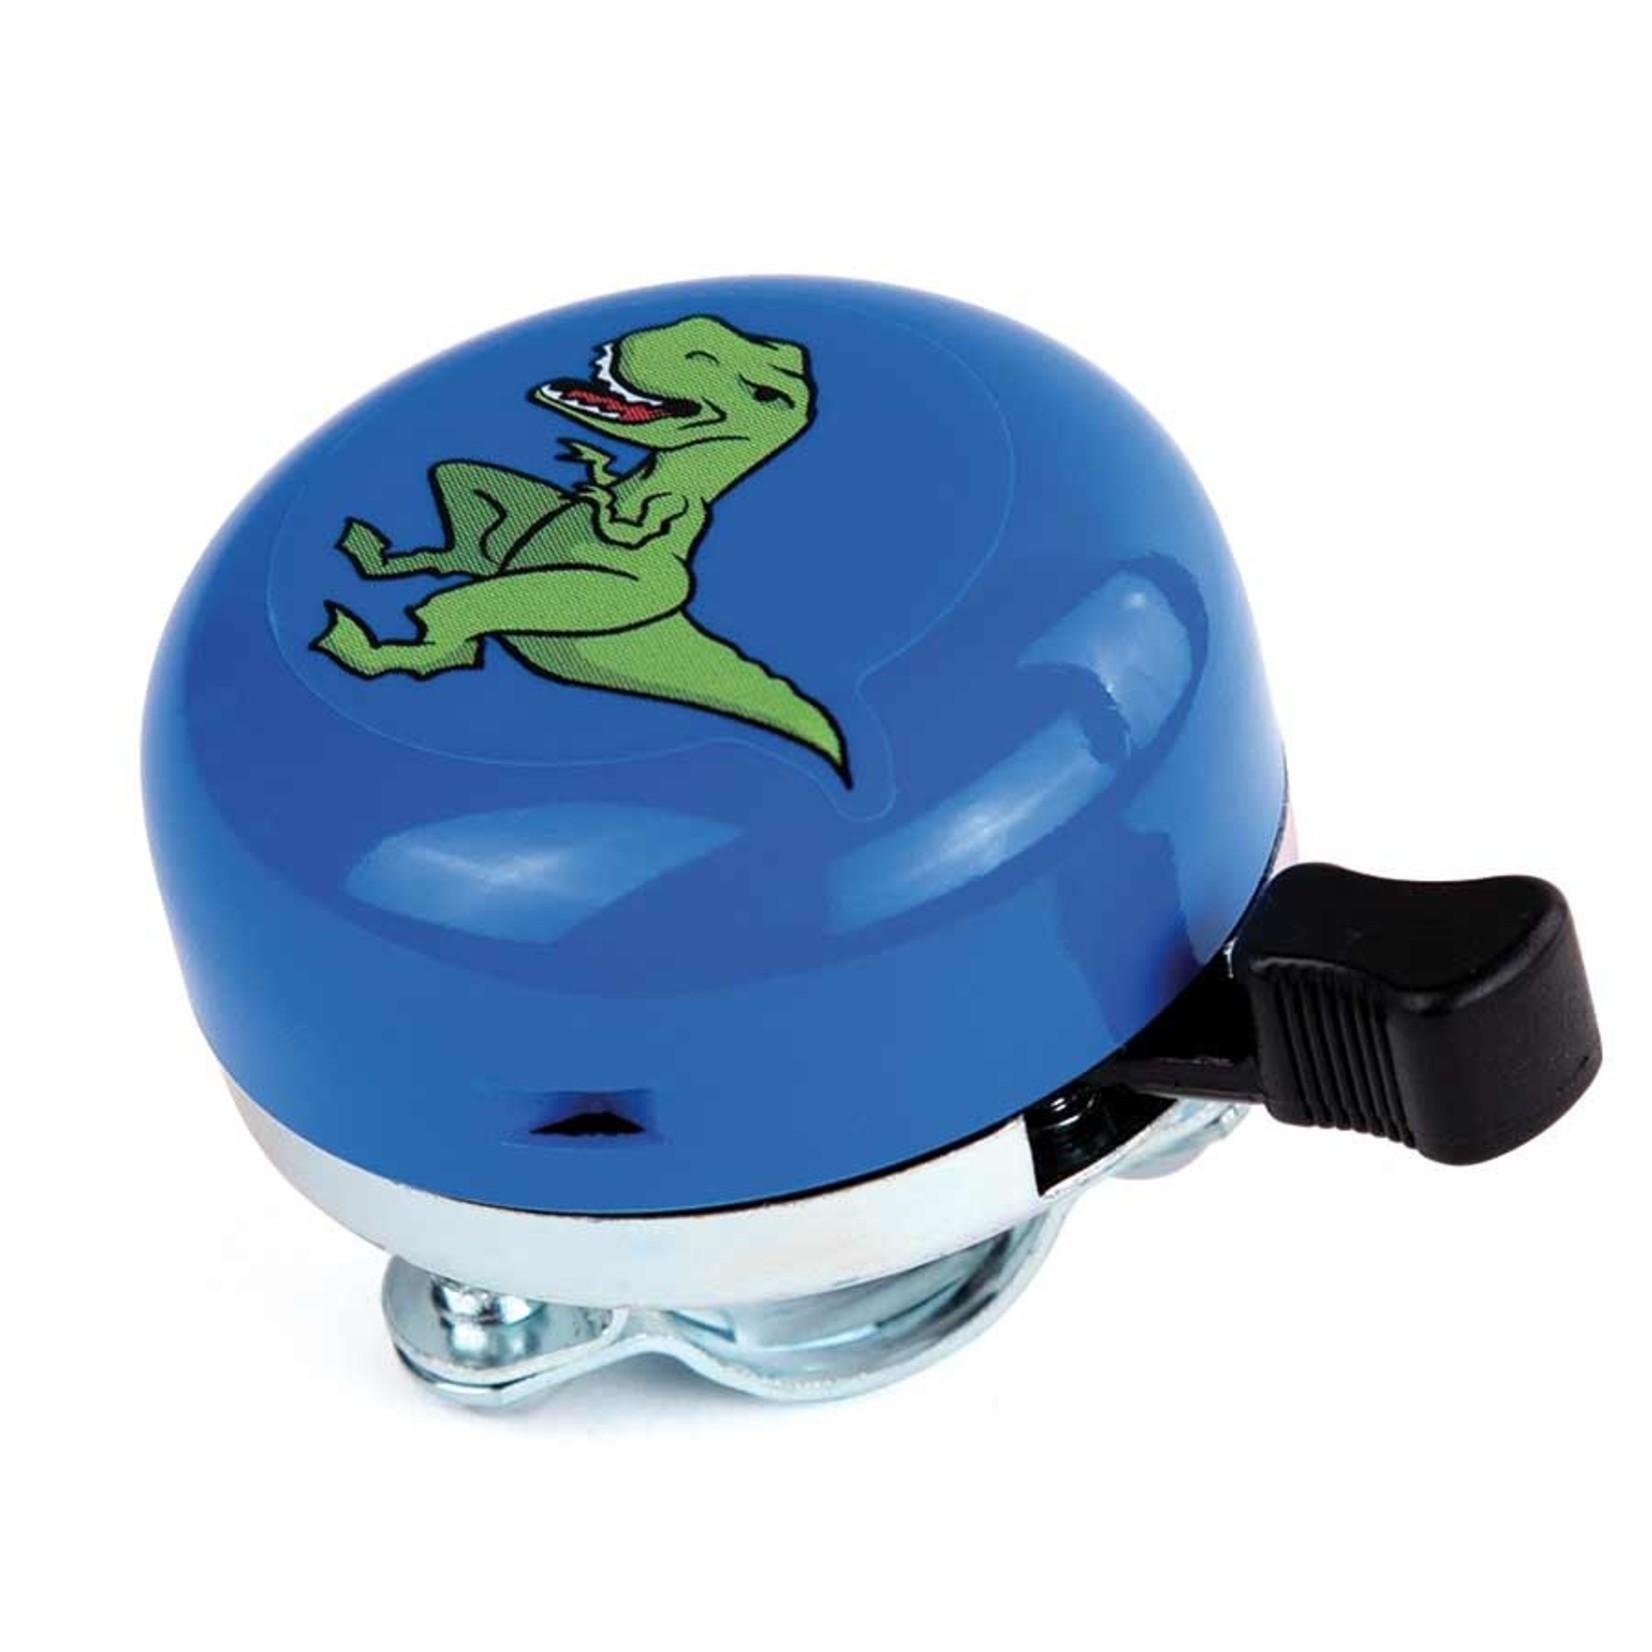 Evo Evo Dinosaur Bell